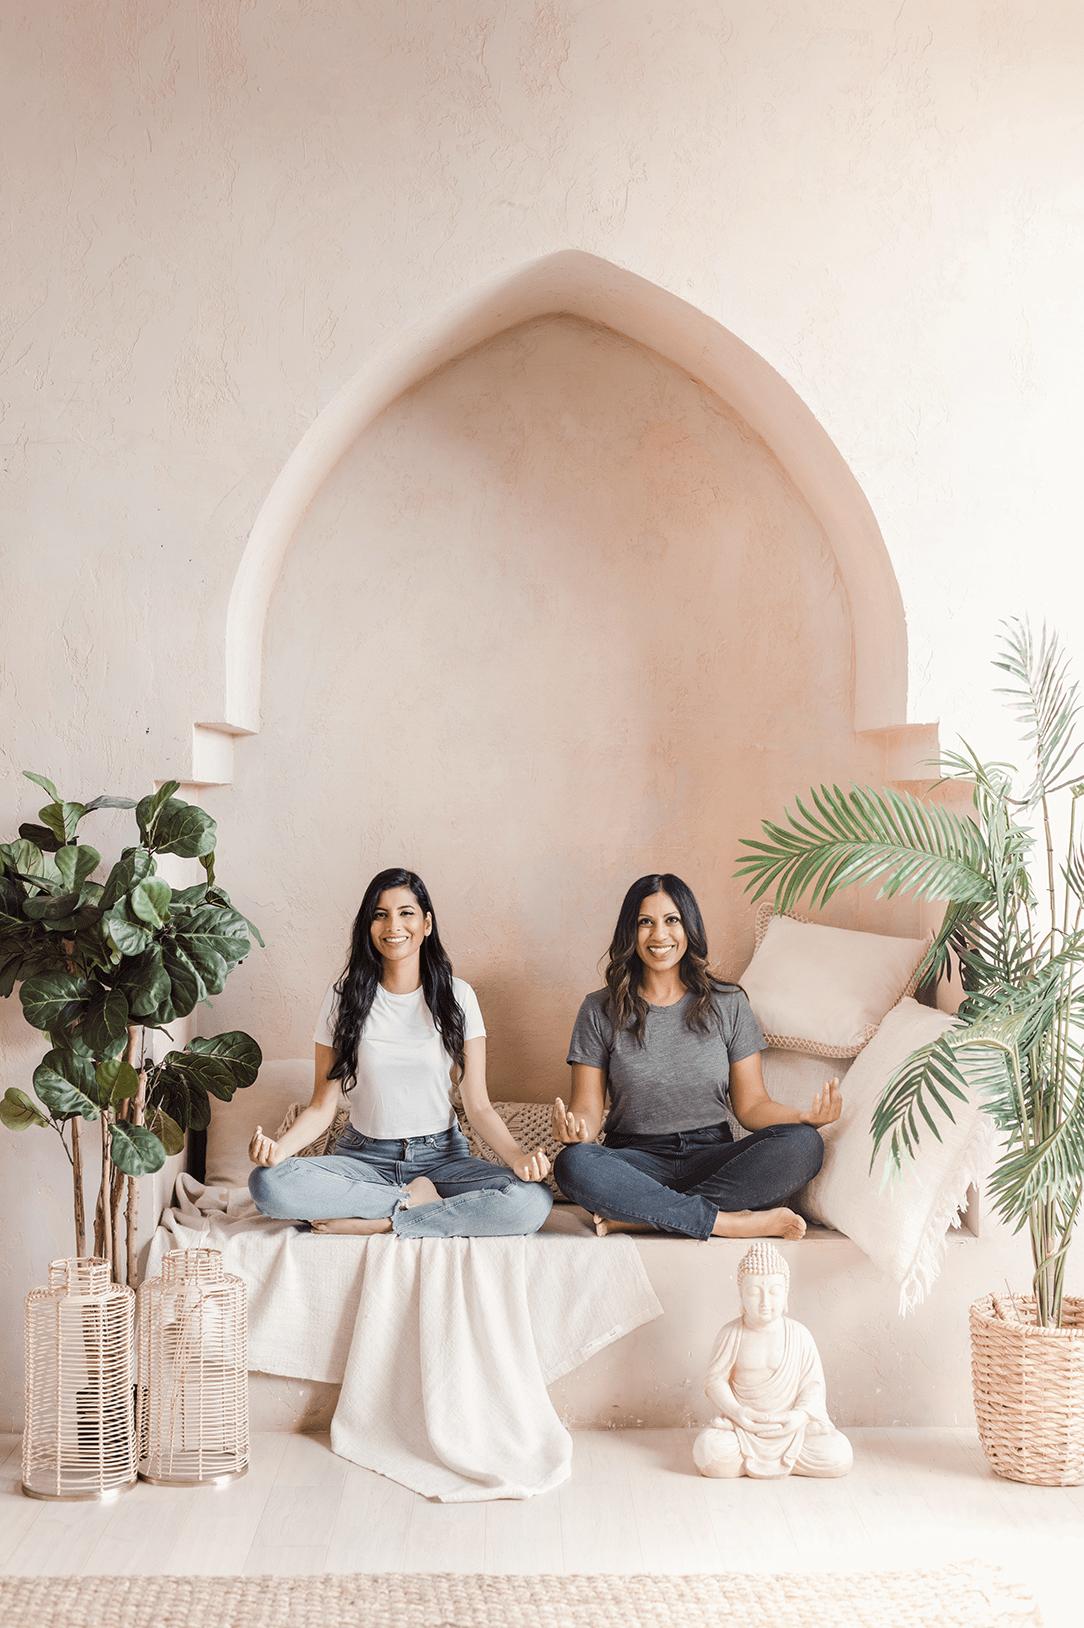 Mahara Mindfulness Co-founders